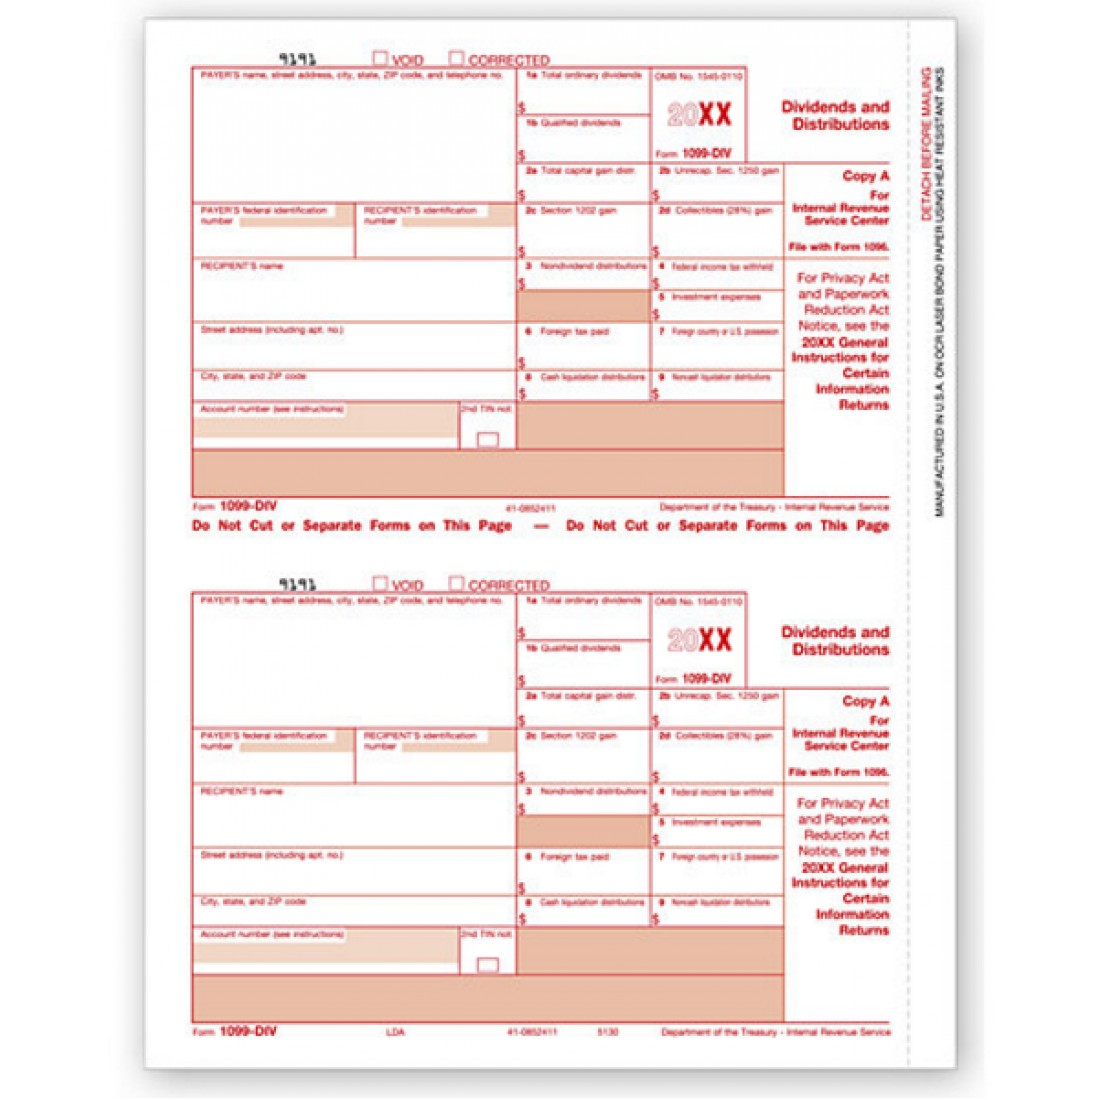 Tax form 1099 div federal copy a free shipping tax form 1099 div federal copy a item no tf5130 size 11 x 8 12 x 11 tax form 1099 div falaconquin